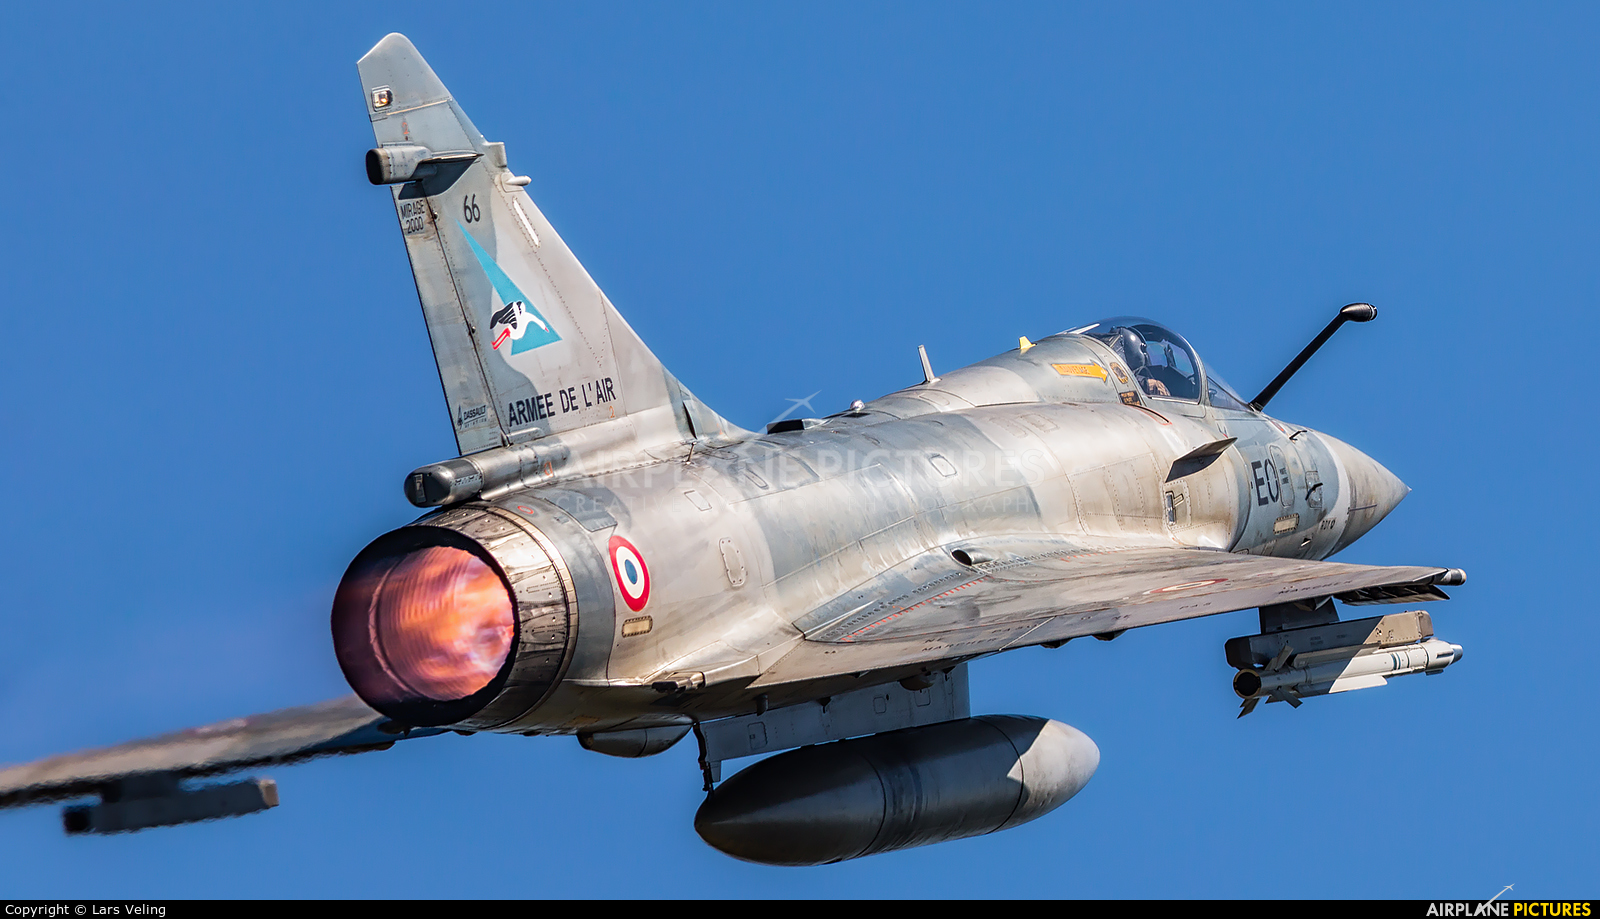 France - Air Force 66 aircraft at Luxeuil-Saint-Sauveur AB